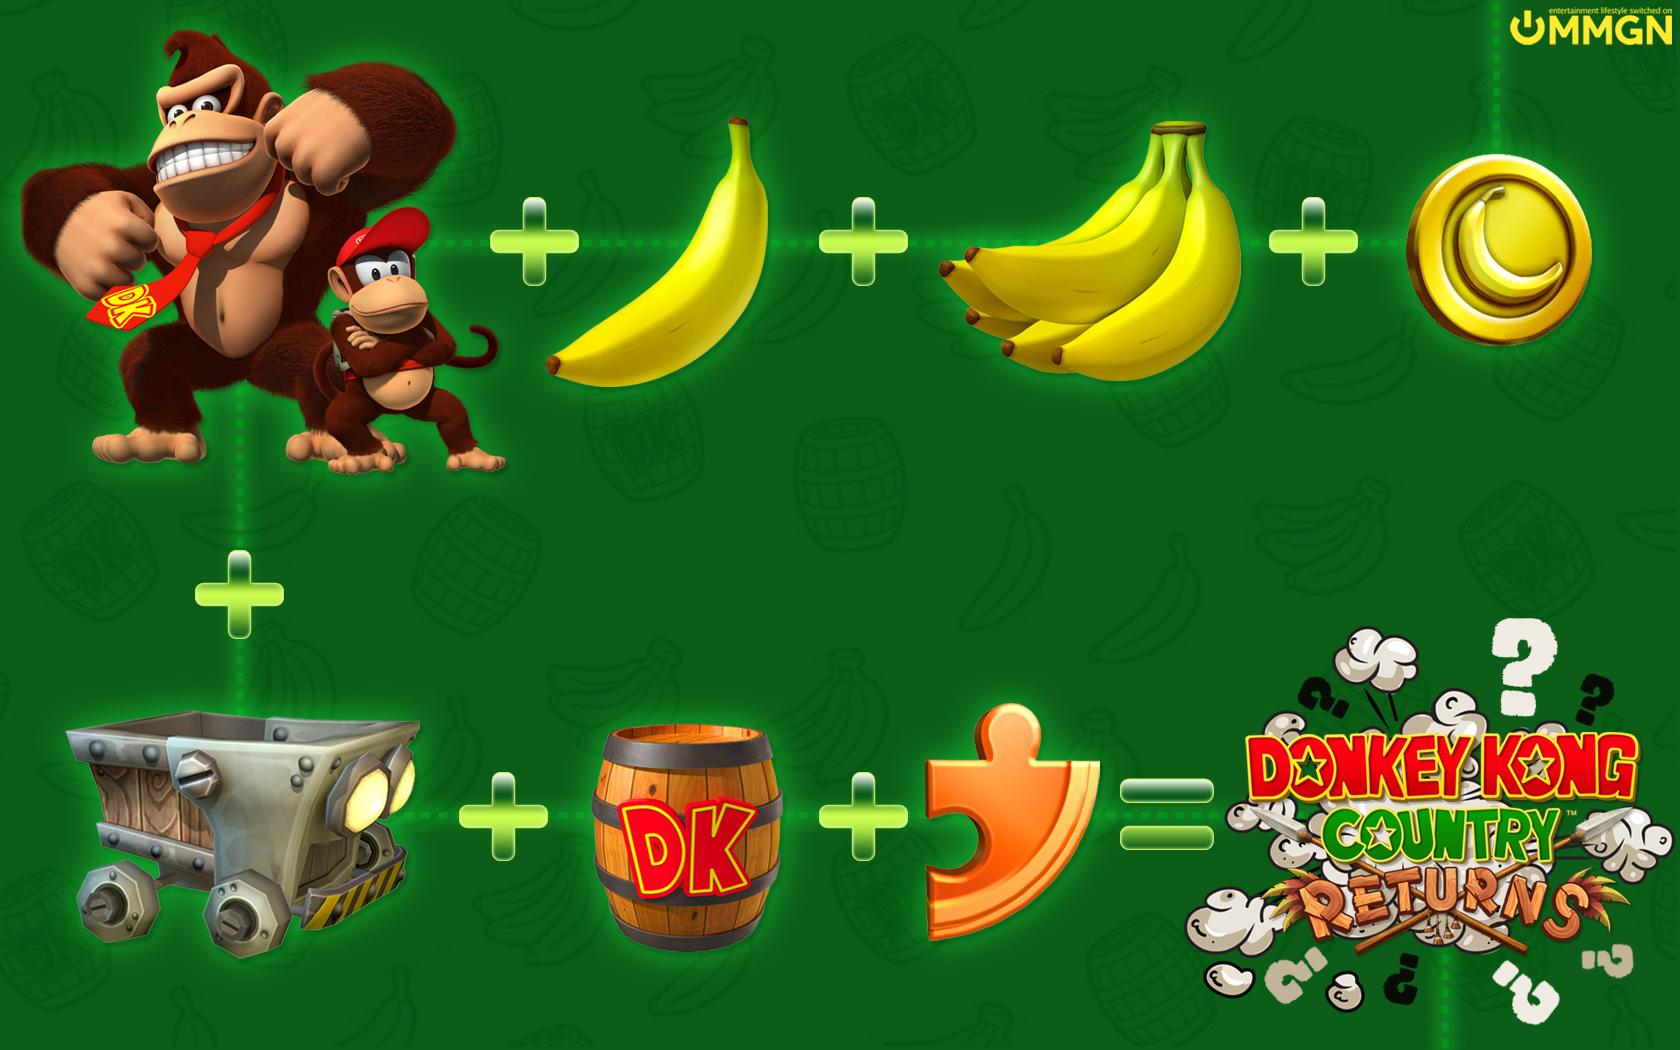 Donkey Kong Country Returns Donkey Kong Wallpaper 25771535